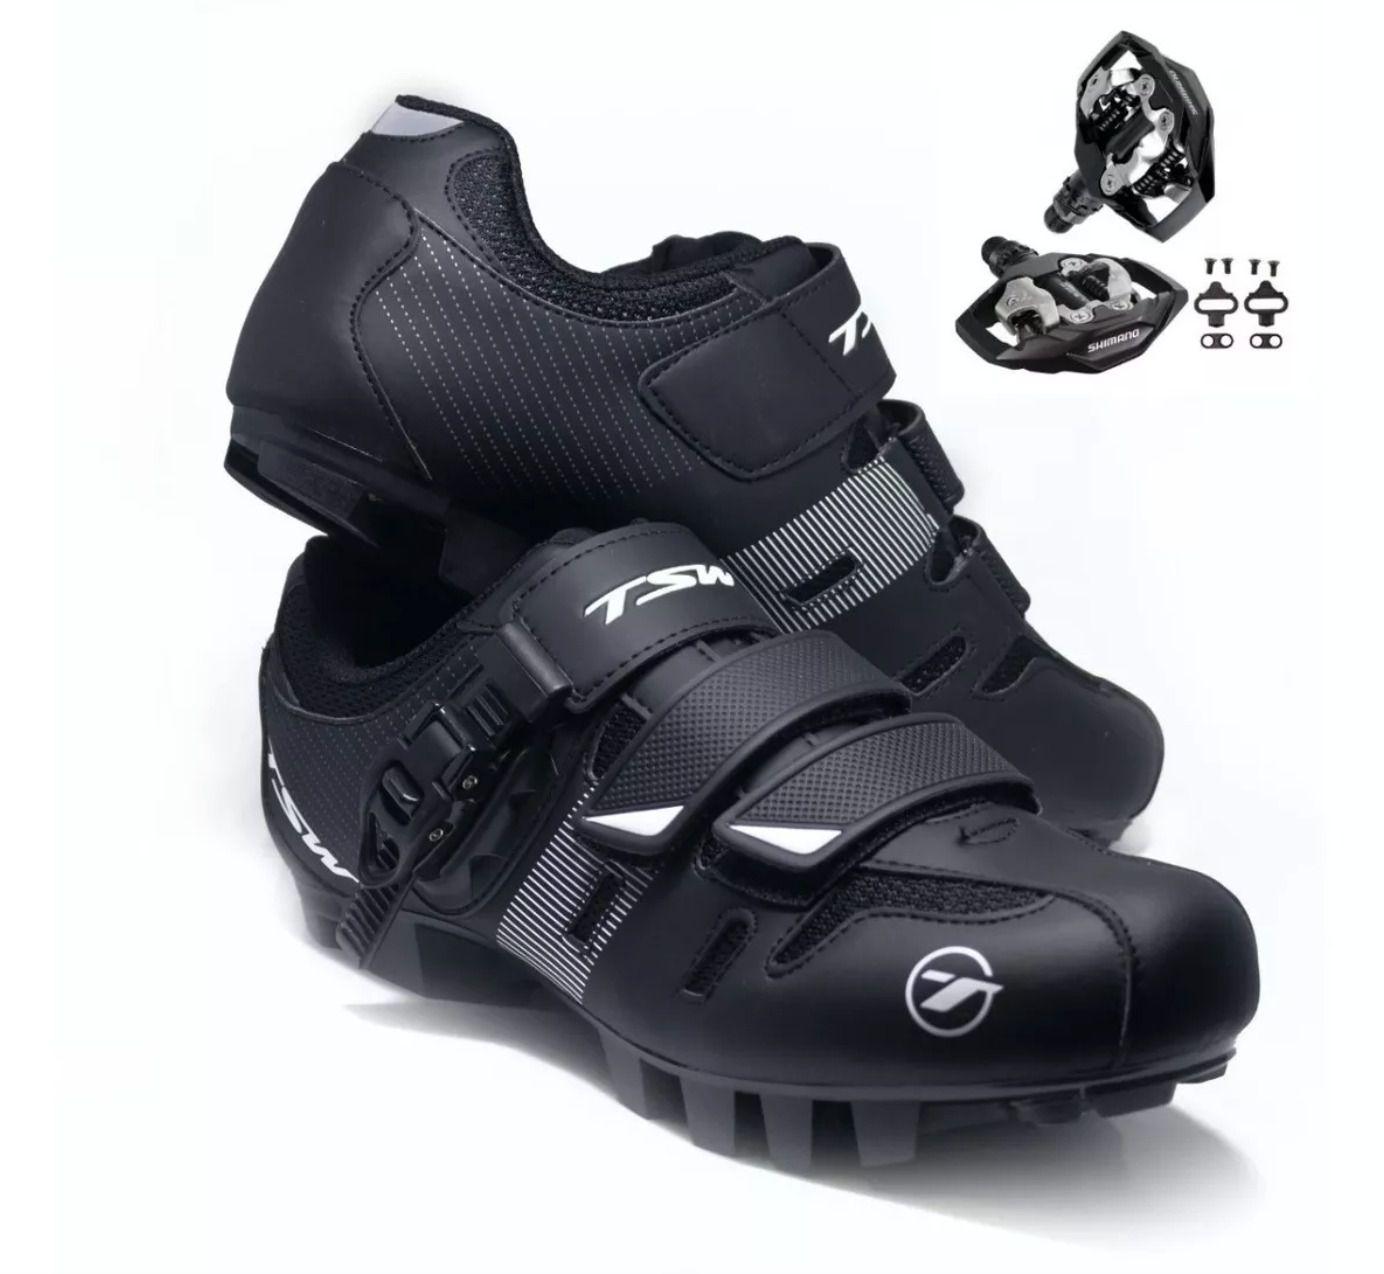 Sapatilha Tsw Cave + Pedal Shimano M530 + Tacos Clip